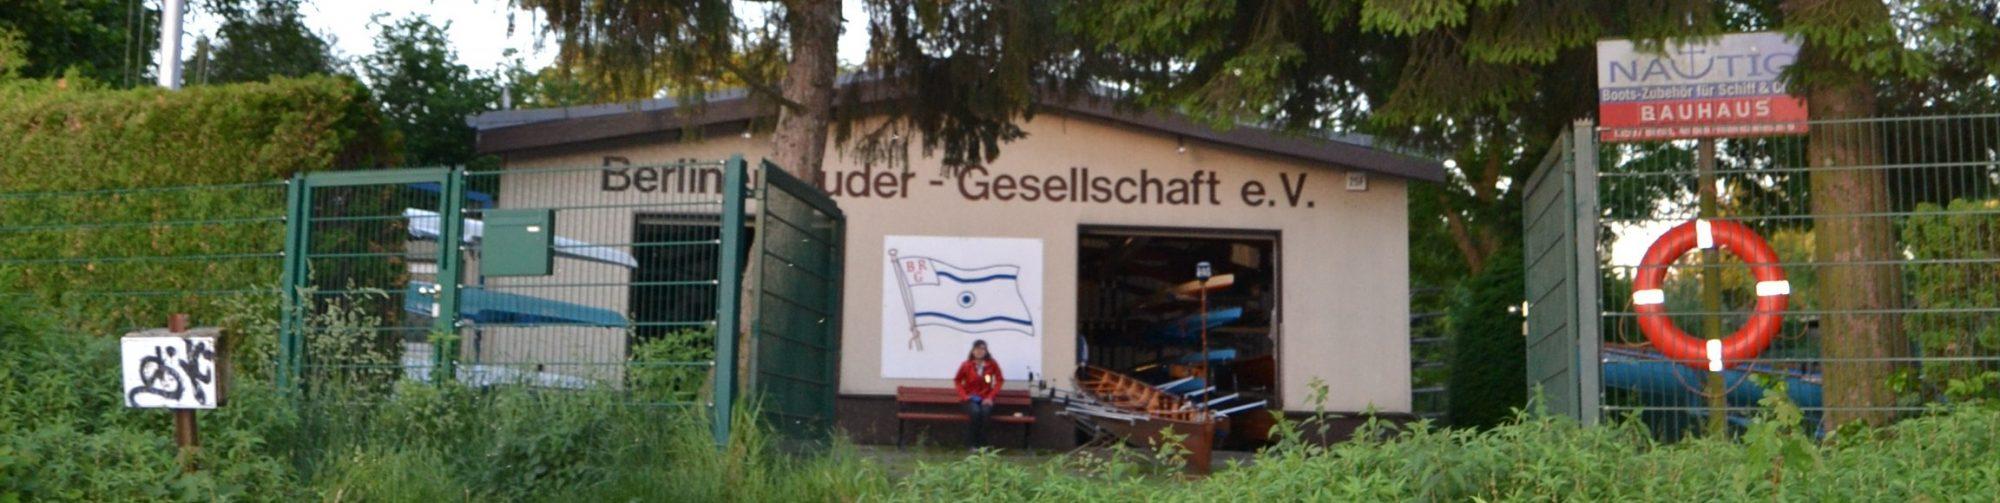 Berliner Ruder-Gesellschaft e.V.